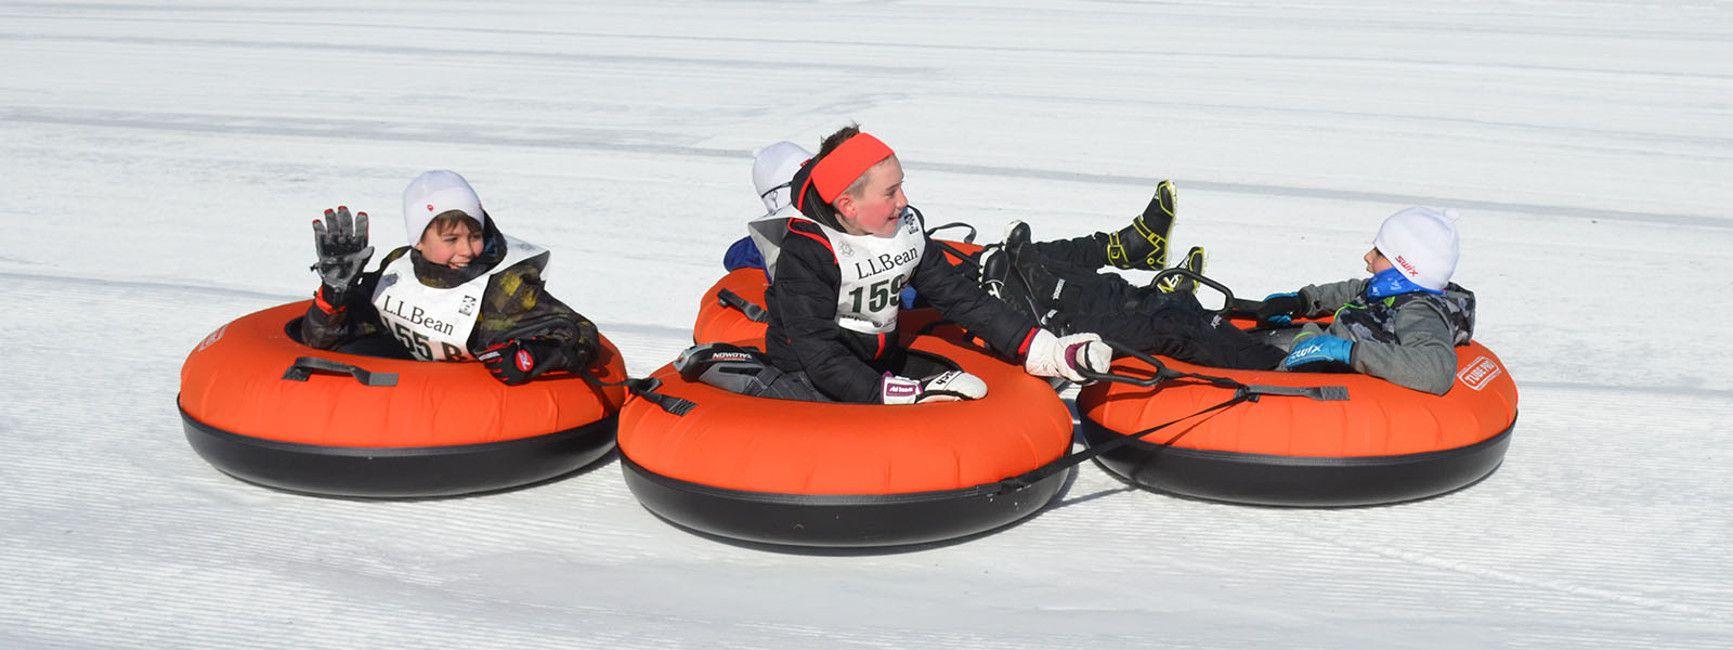 Boys snow tubing at Great Glen Trails